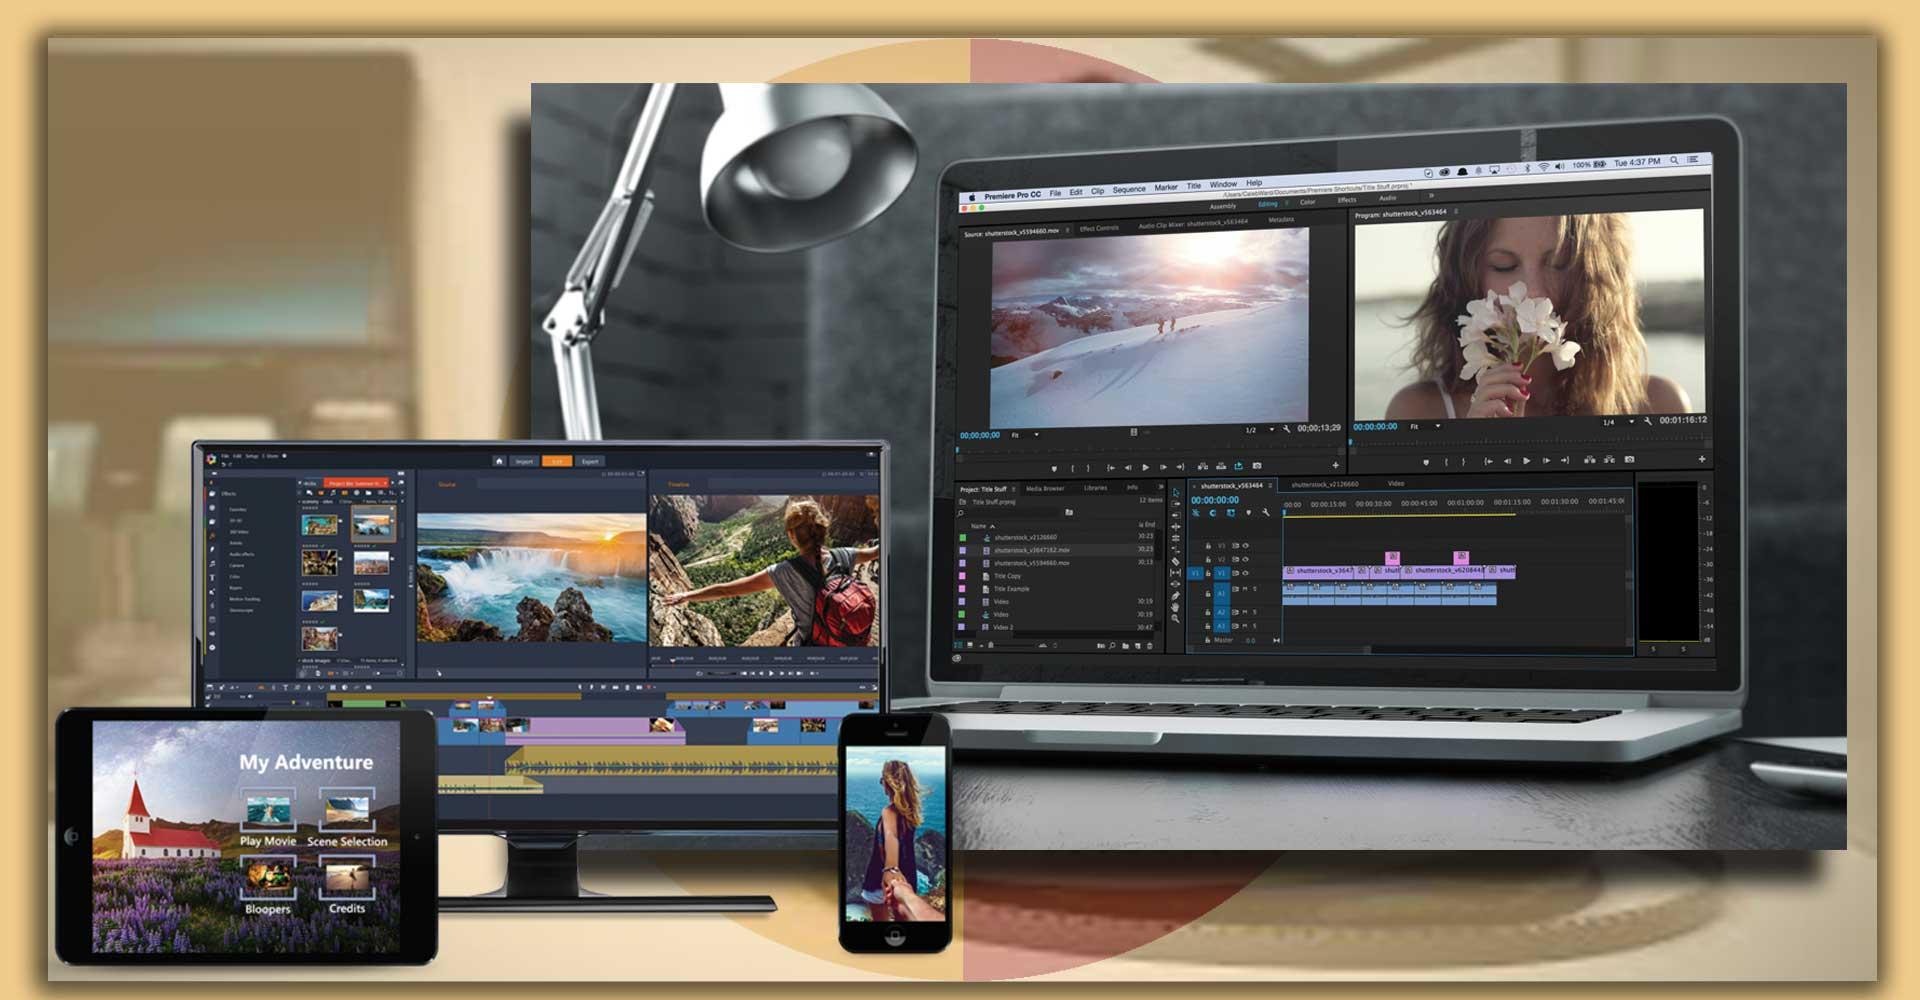 Video Editing bes4 - چگونه تدوینگر شویم ؟ 5 روش